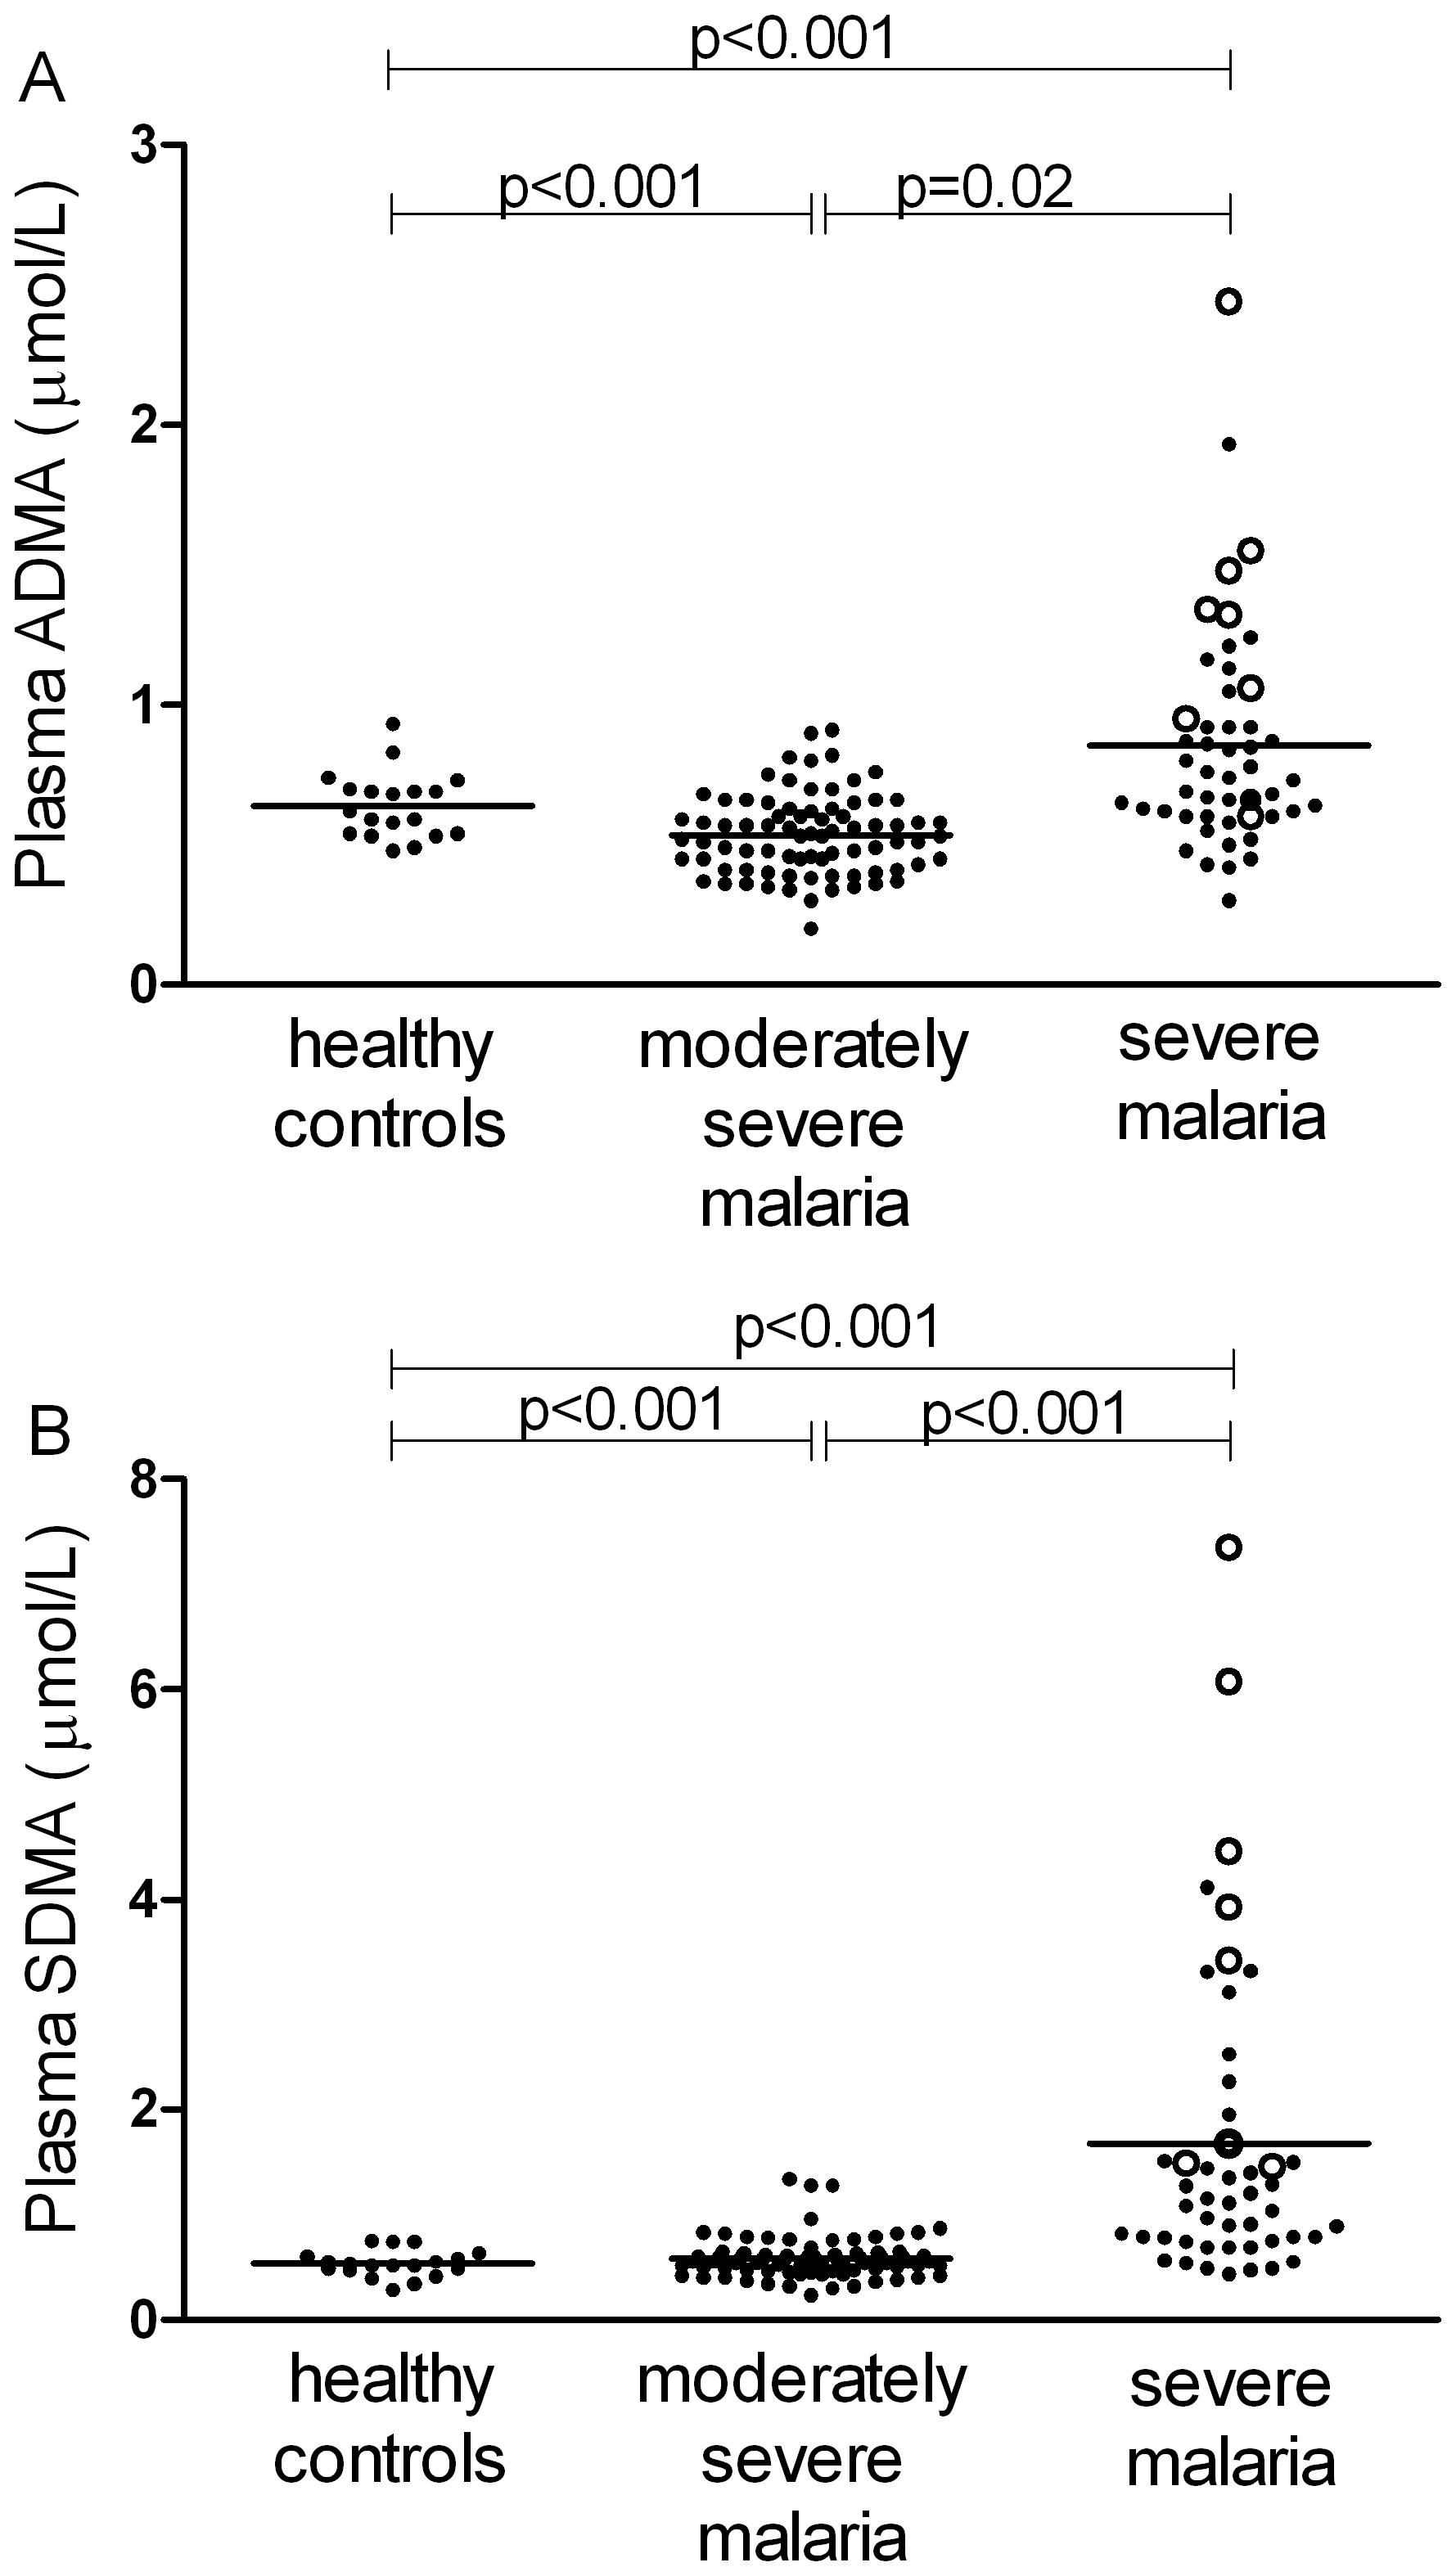 Longitudinal course of plasma ADMA concentrations and L-arginine/ADMA ratio in patients with severe malaria.